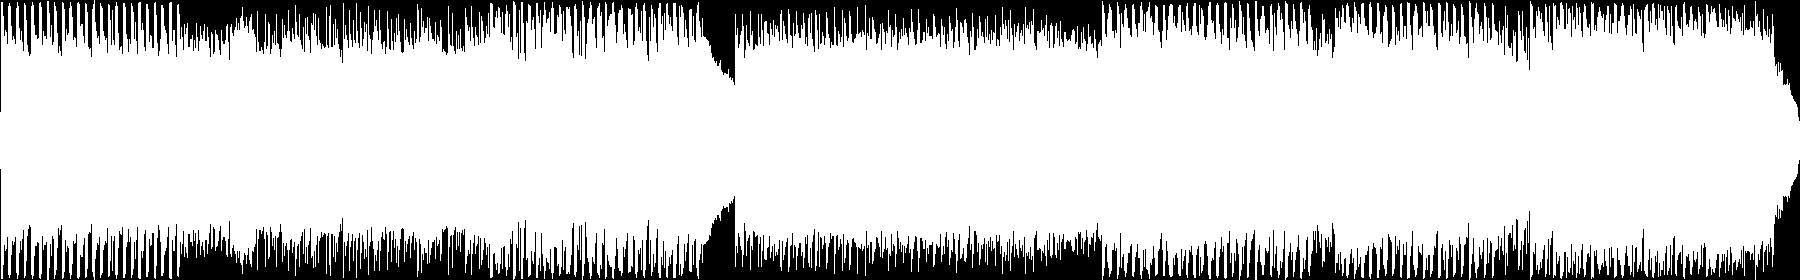 Mediterranean [Bouzouki Loops] audio waveform